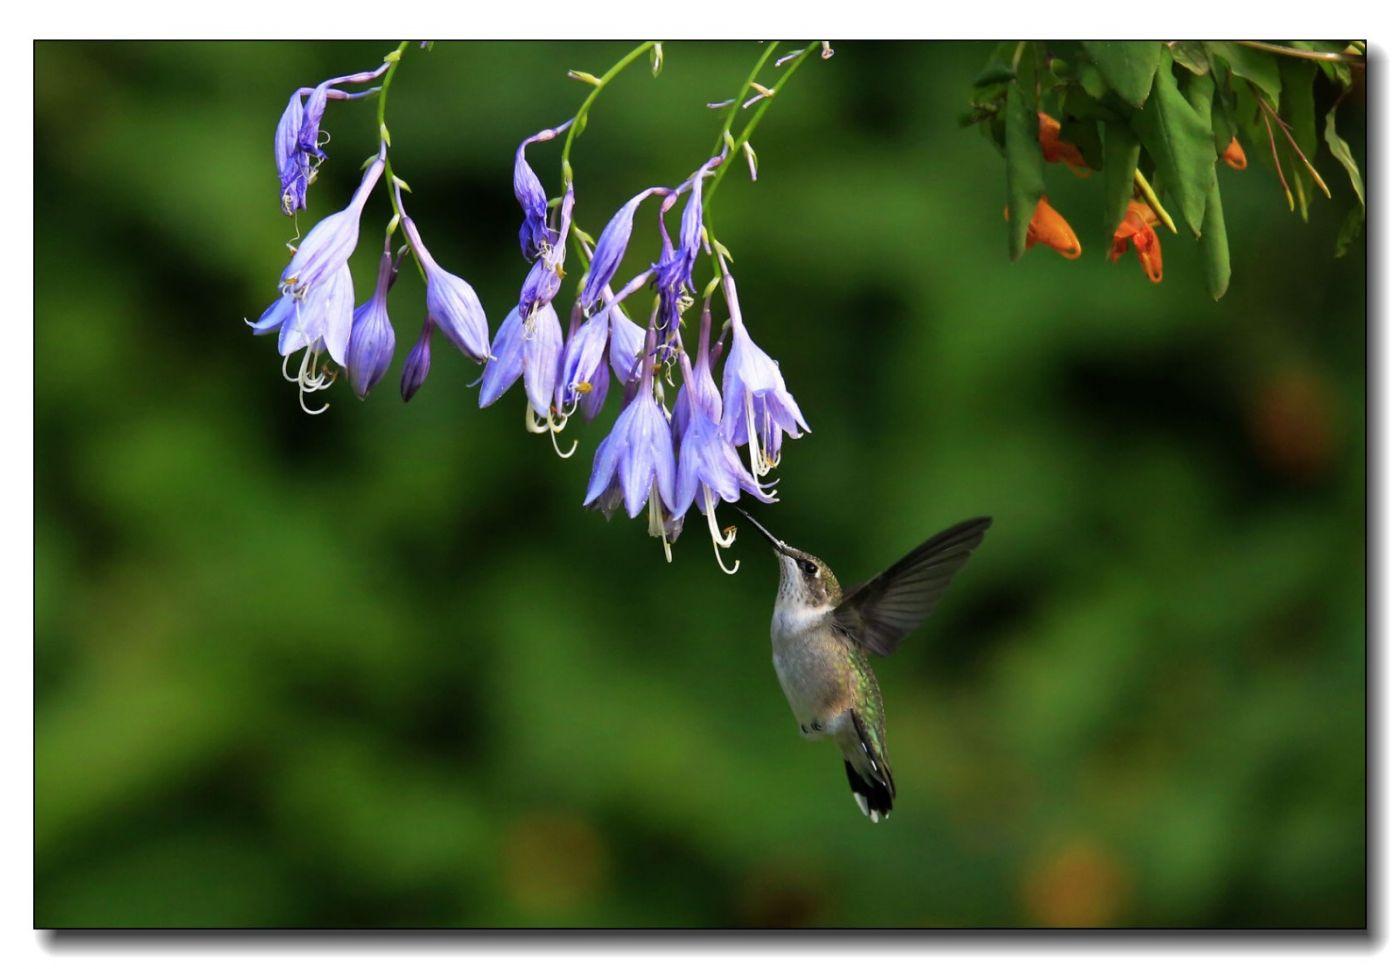 蜂鸟组图(六)_图1-1